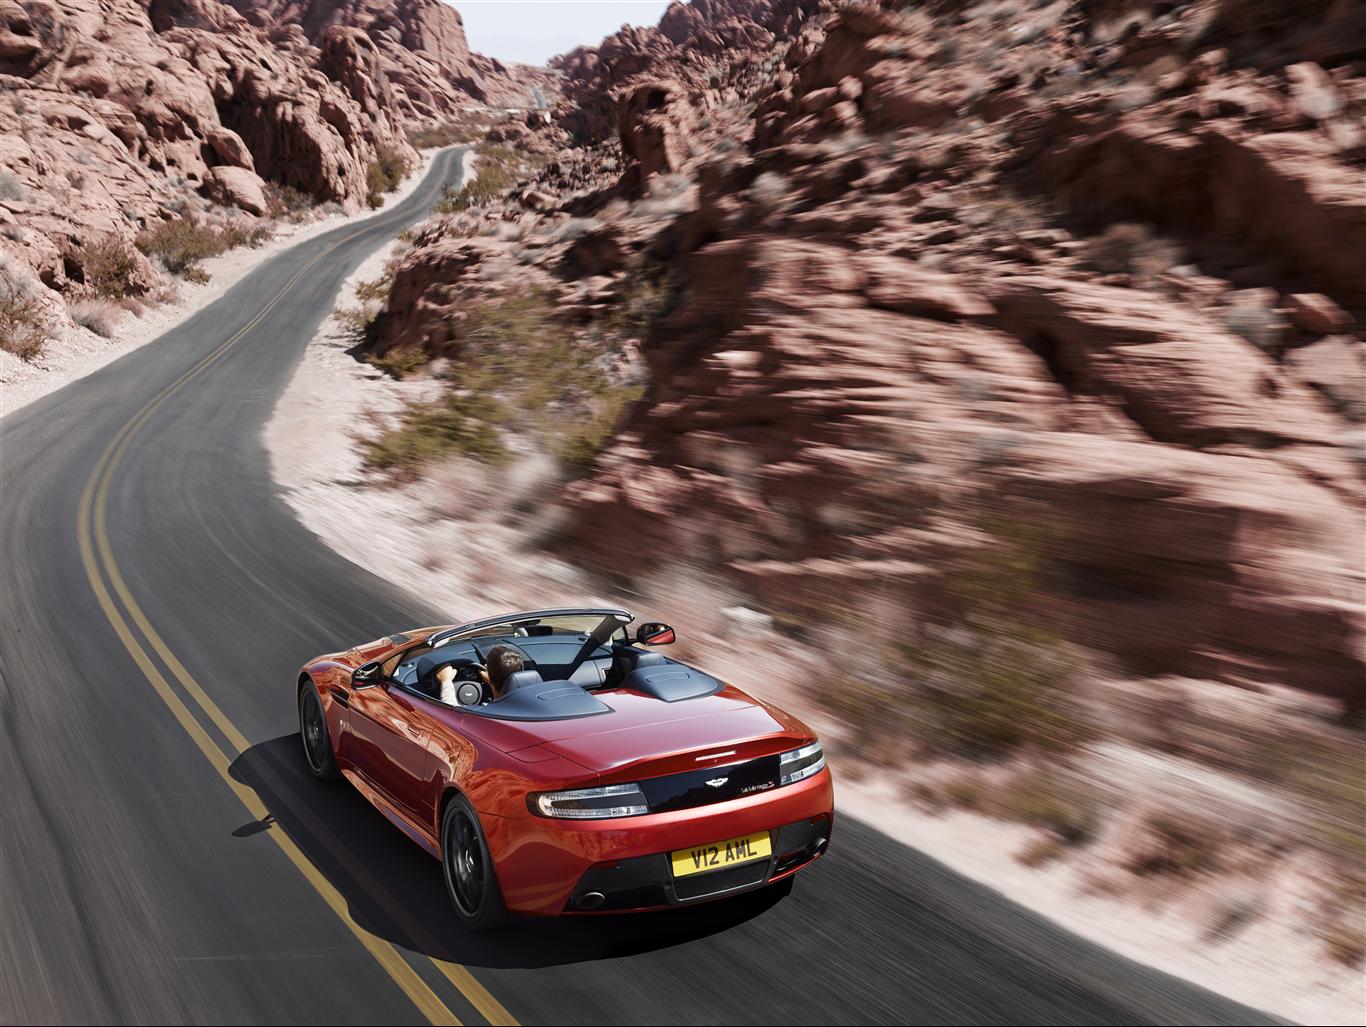 Aston Martin V12 Vantage S Roadster 2015 - 7